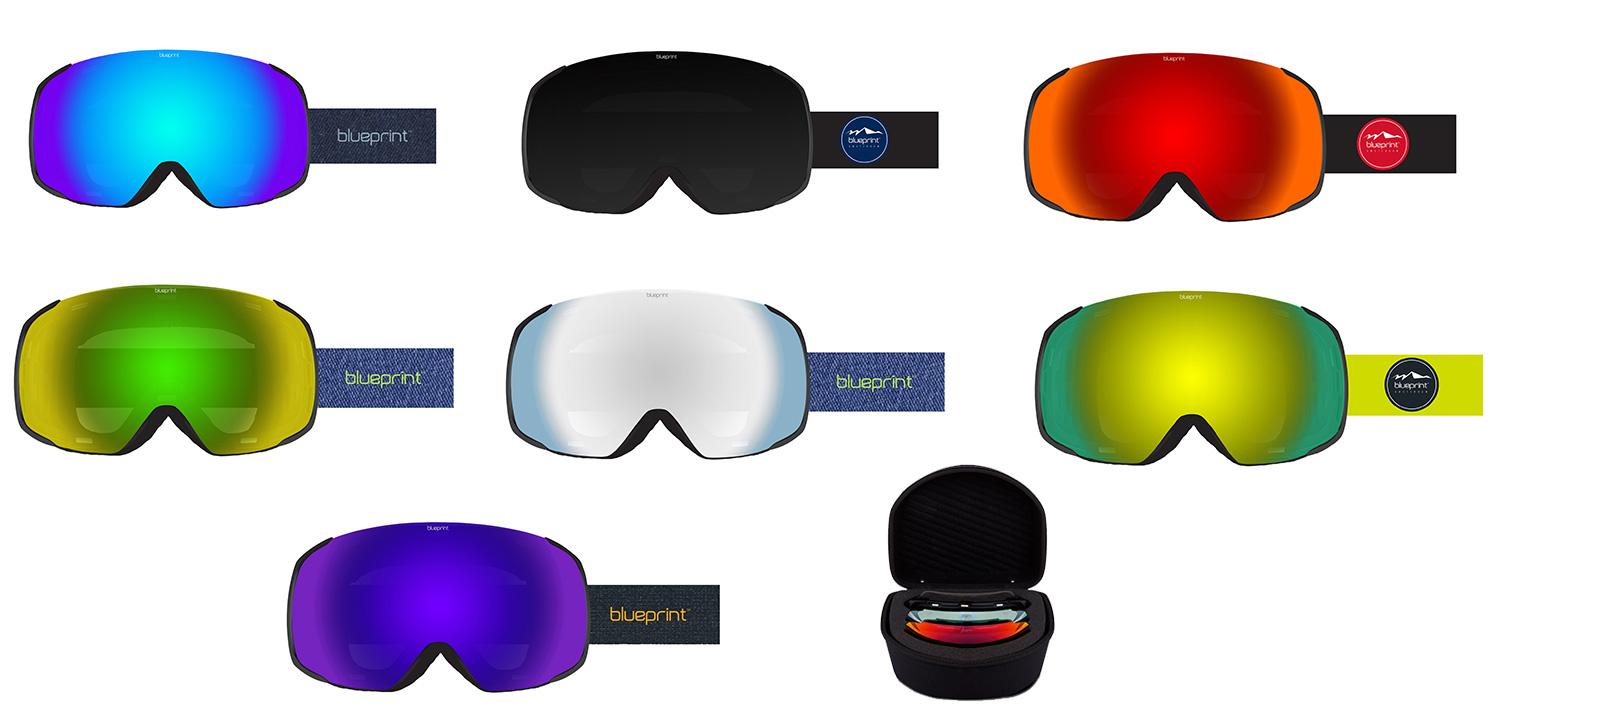 blueprint-goggles